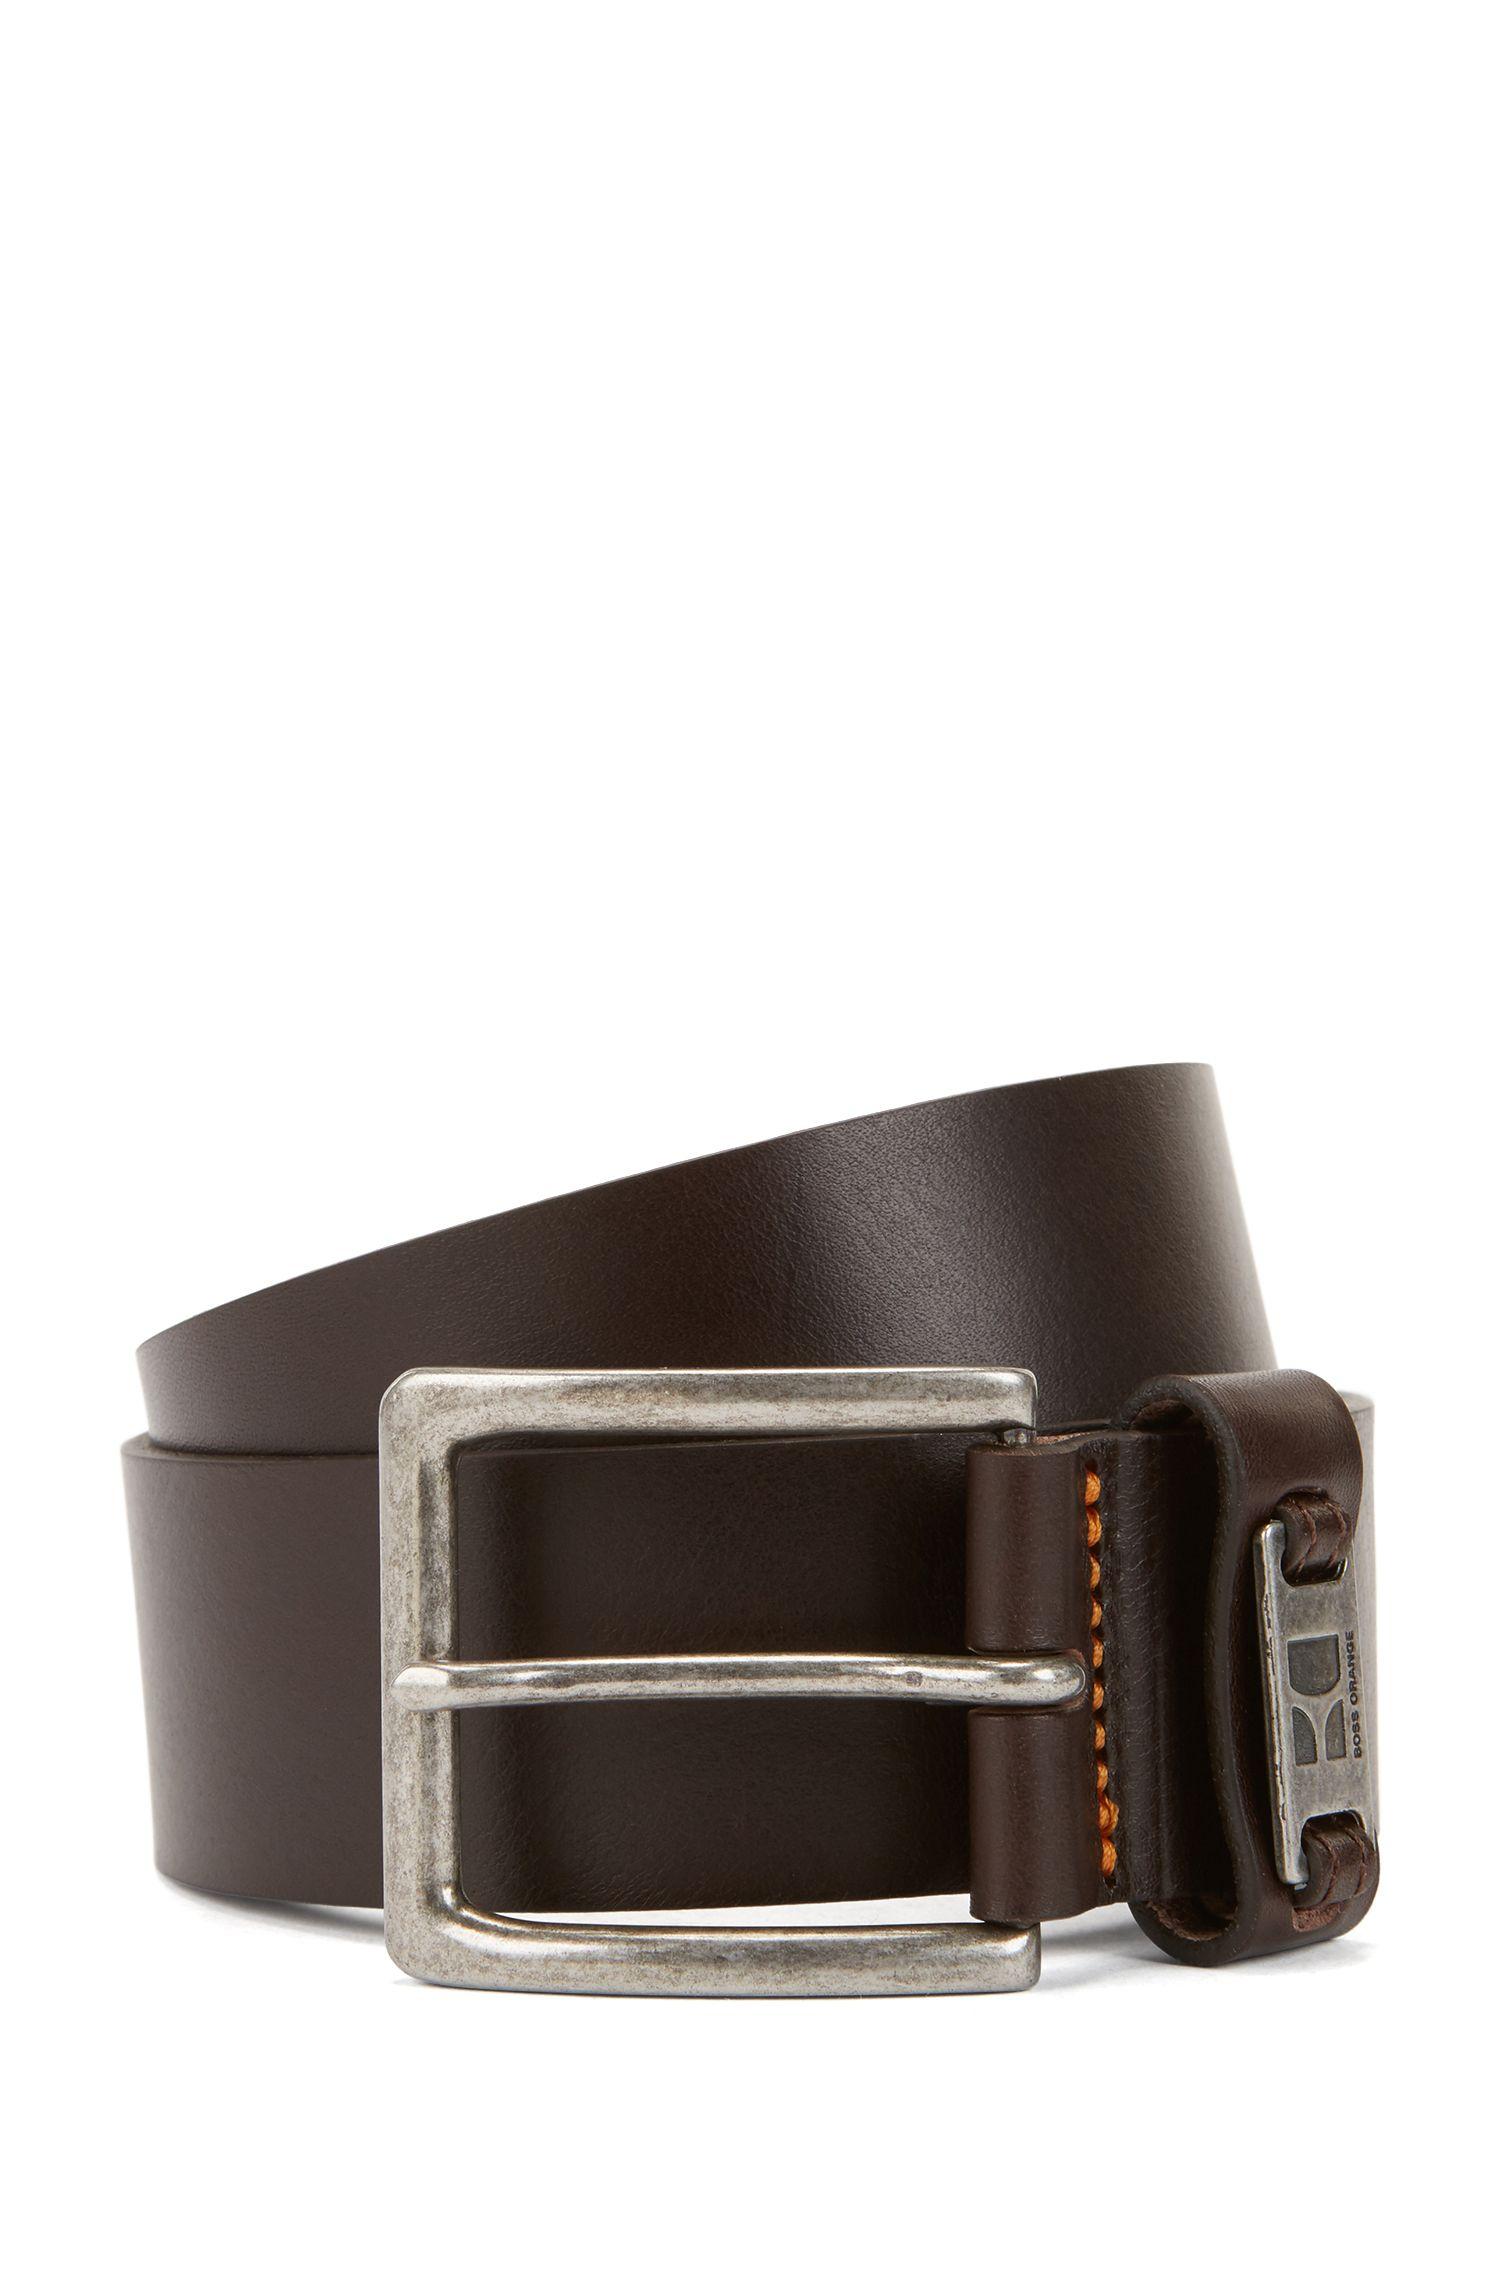 Cintura in pelle con passante in metallo con logo